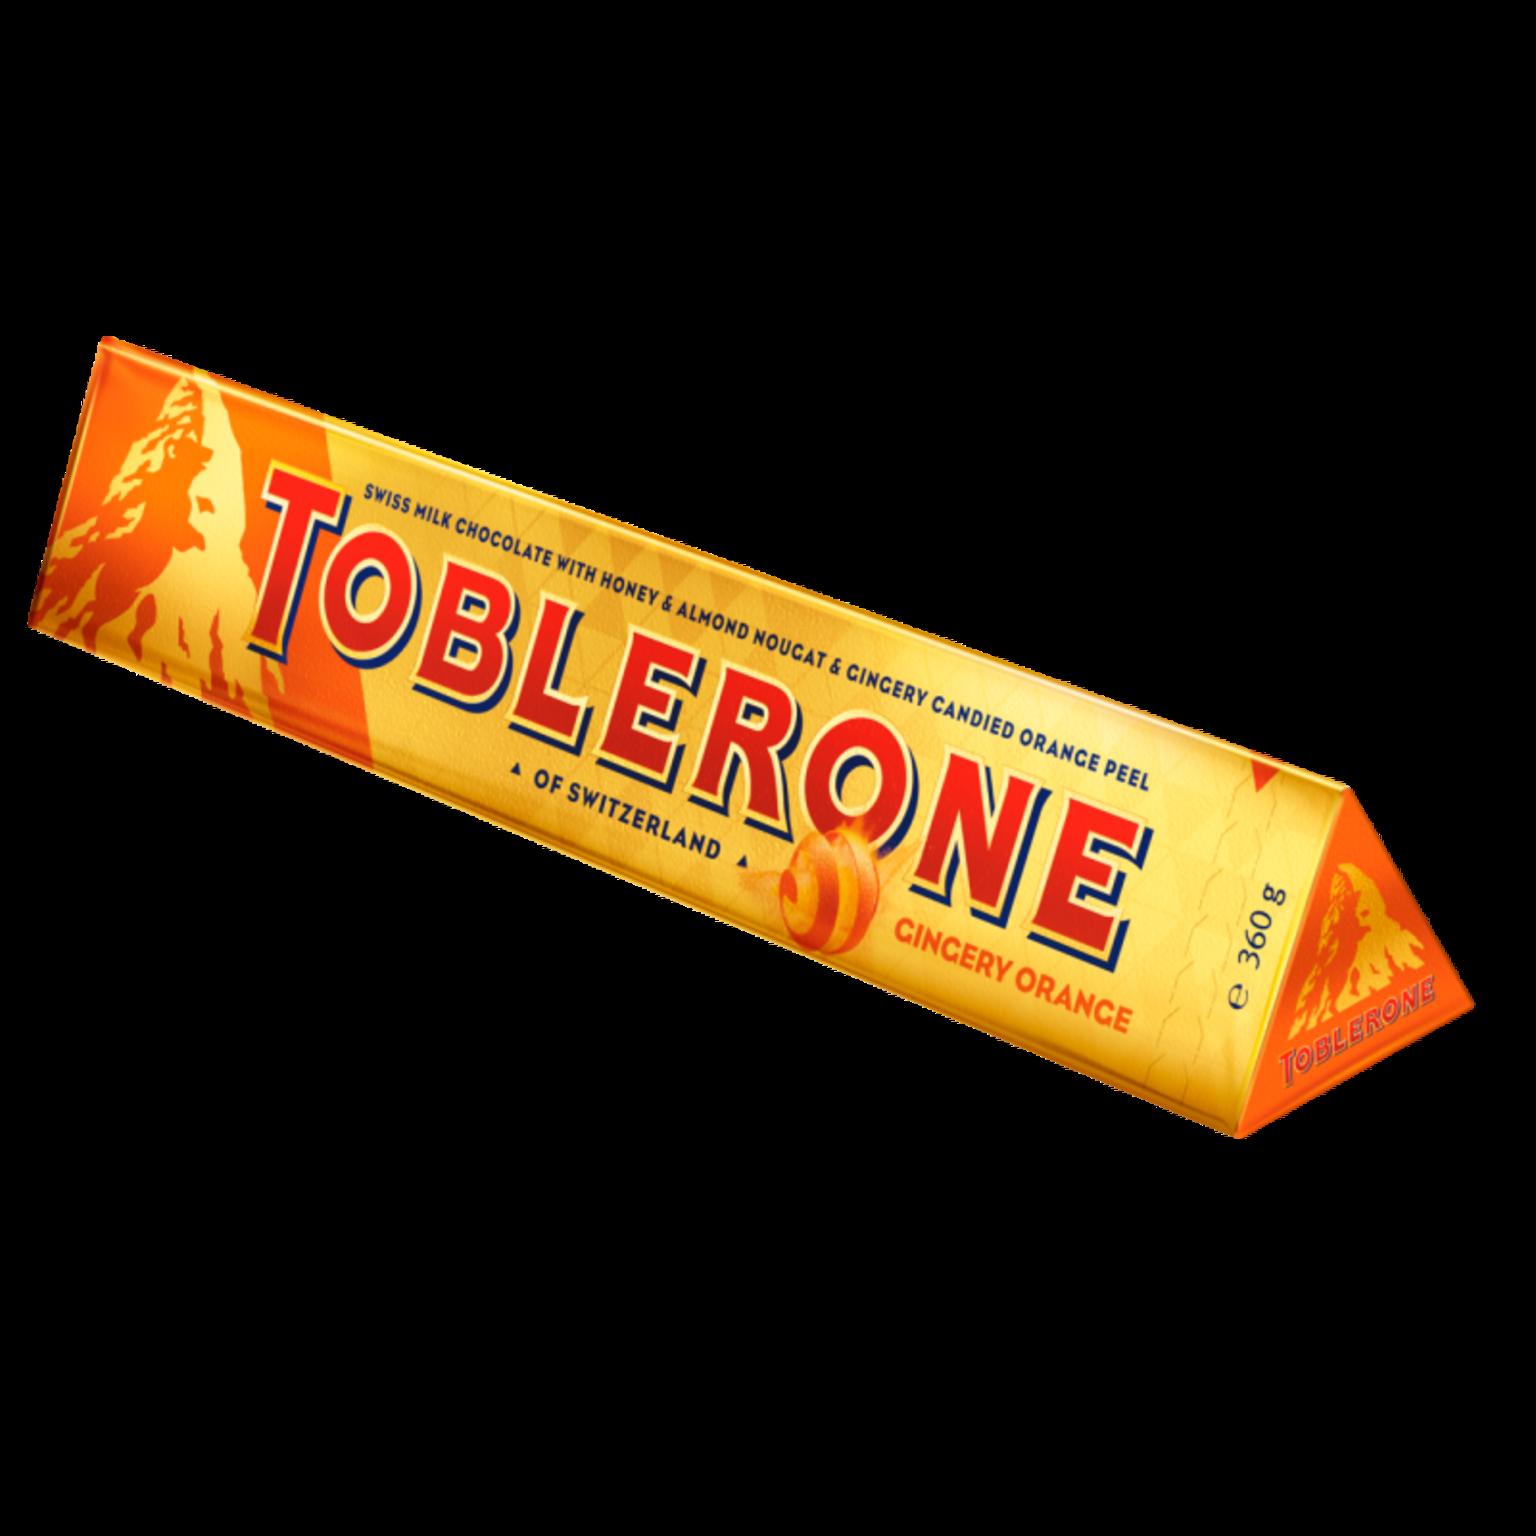 Toblerone Gingery Orange 360g